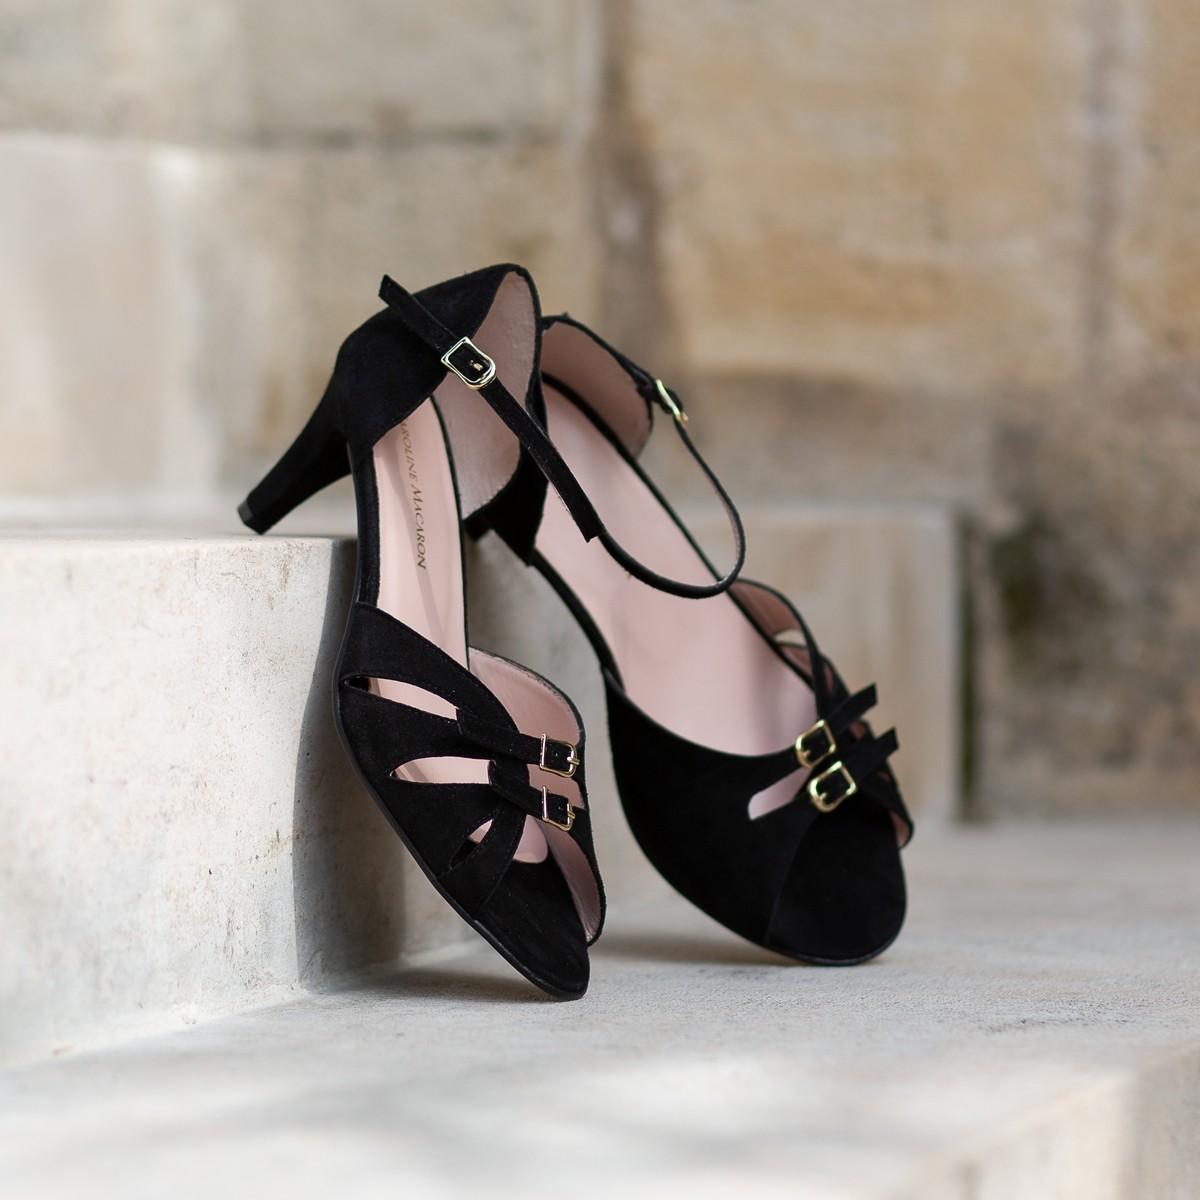 Sandales hallux valgus Meringue Noir